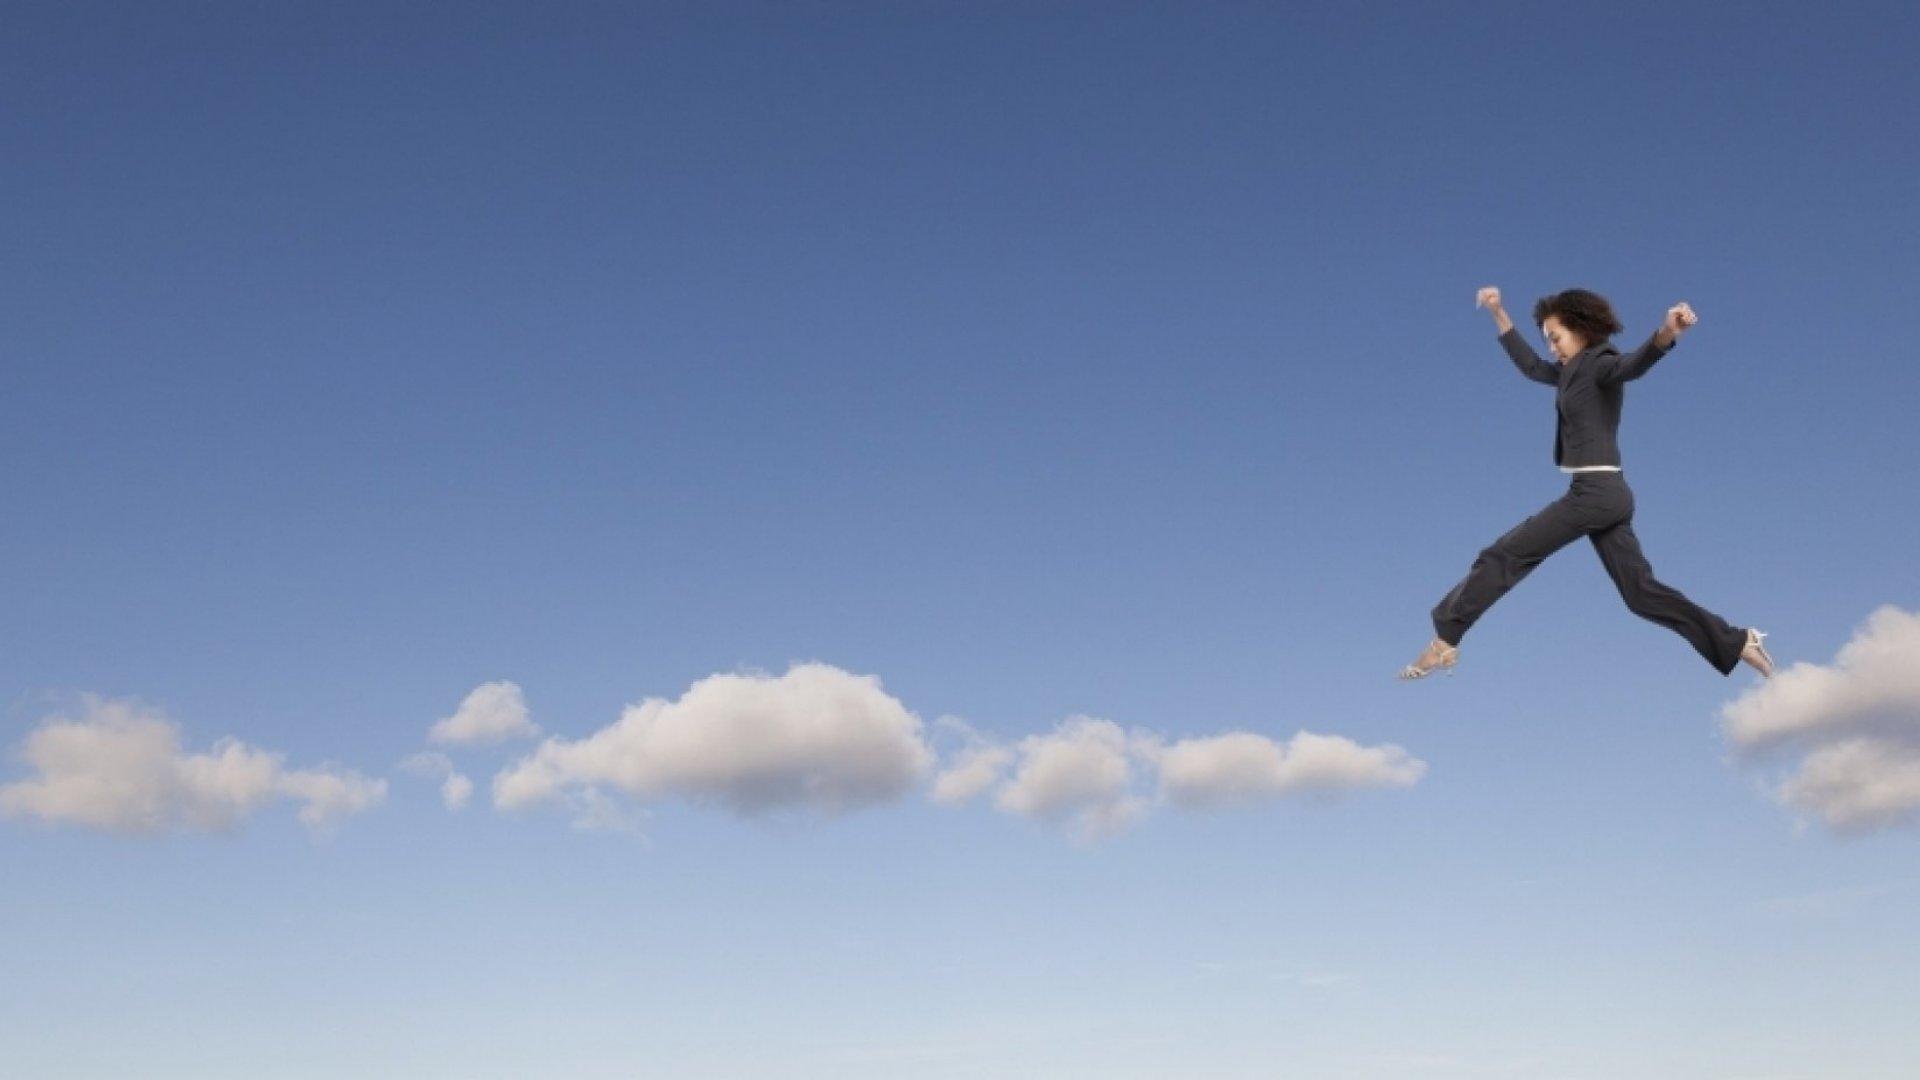 The Entrepreneur Resonance: My Quadrophonic Mantra